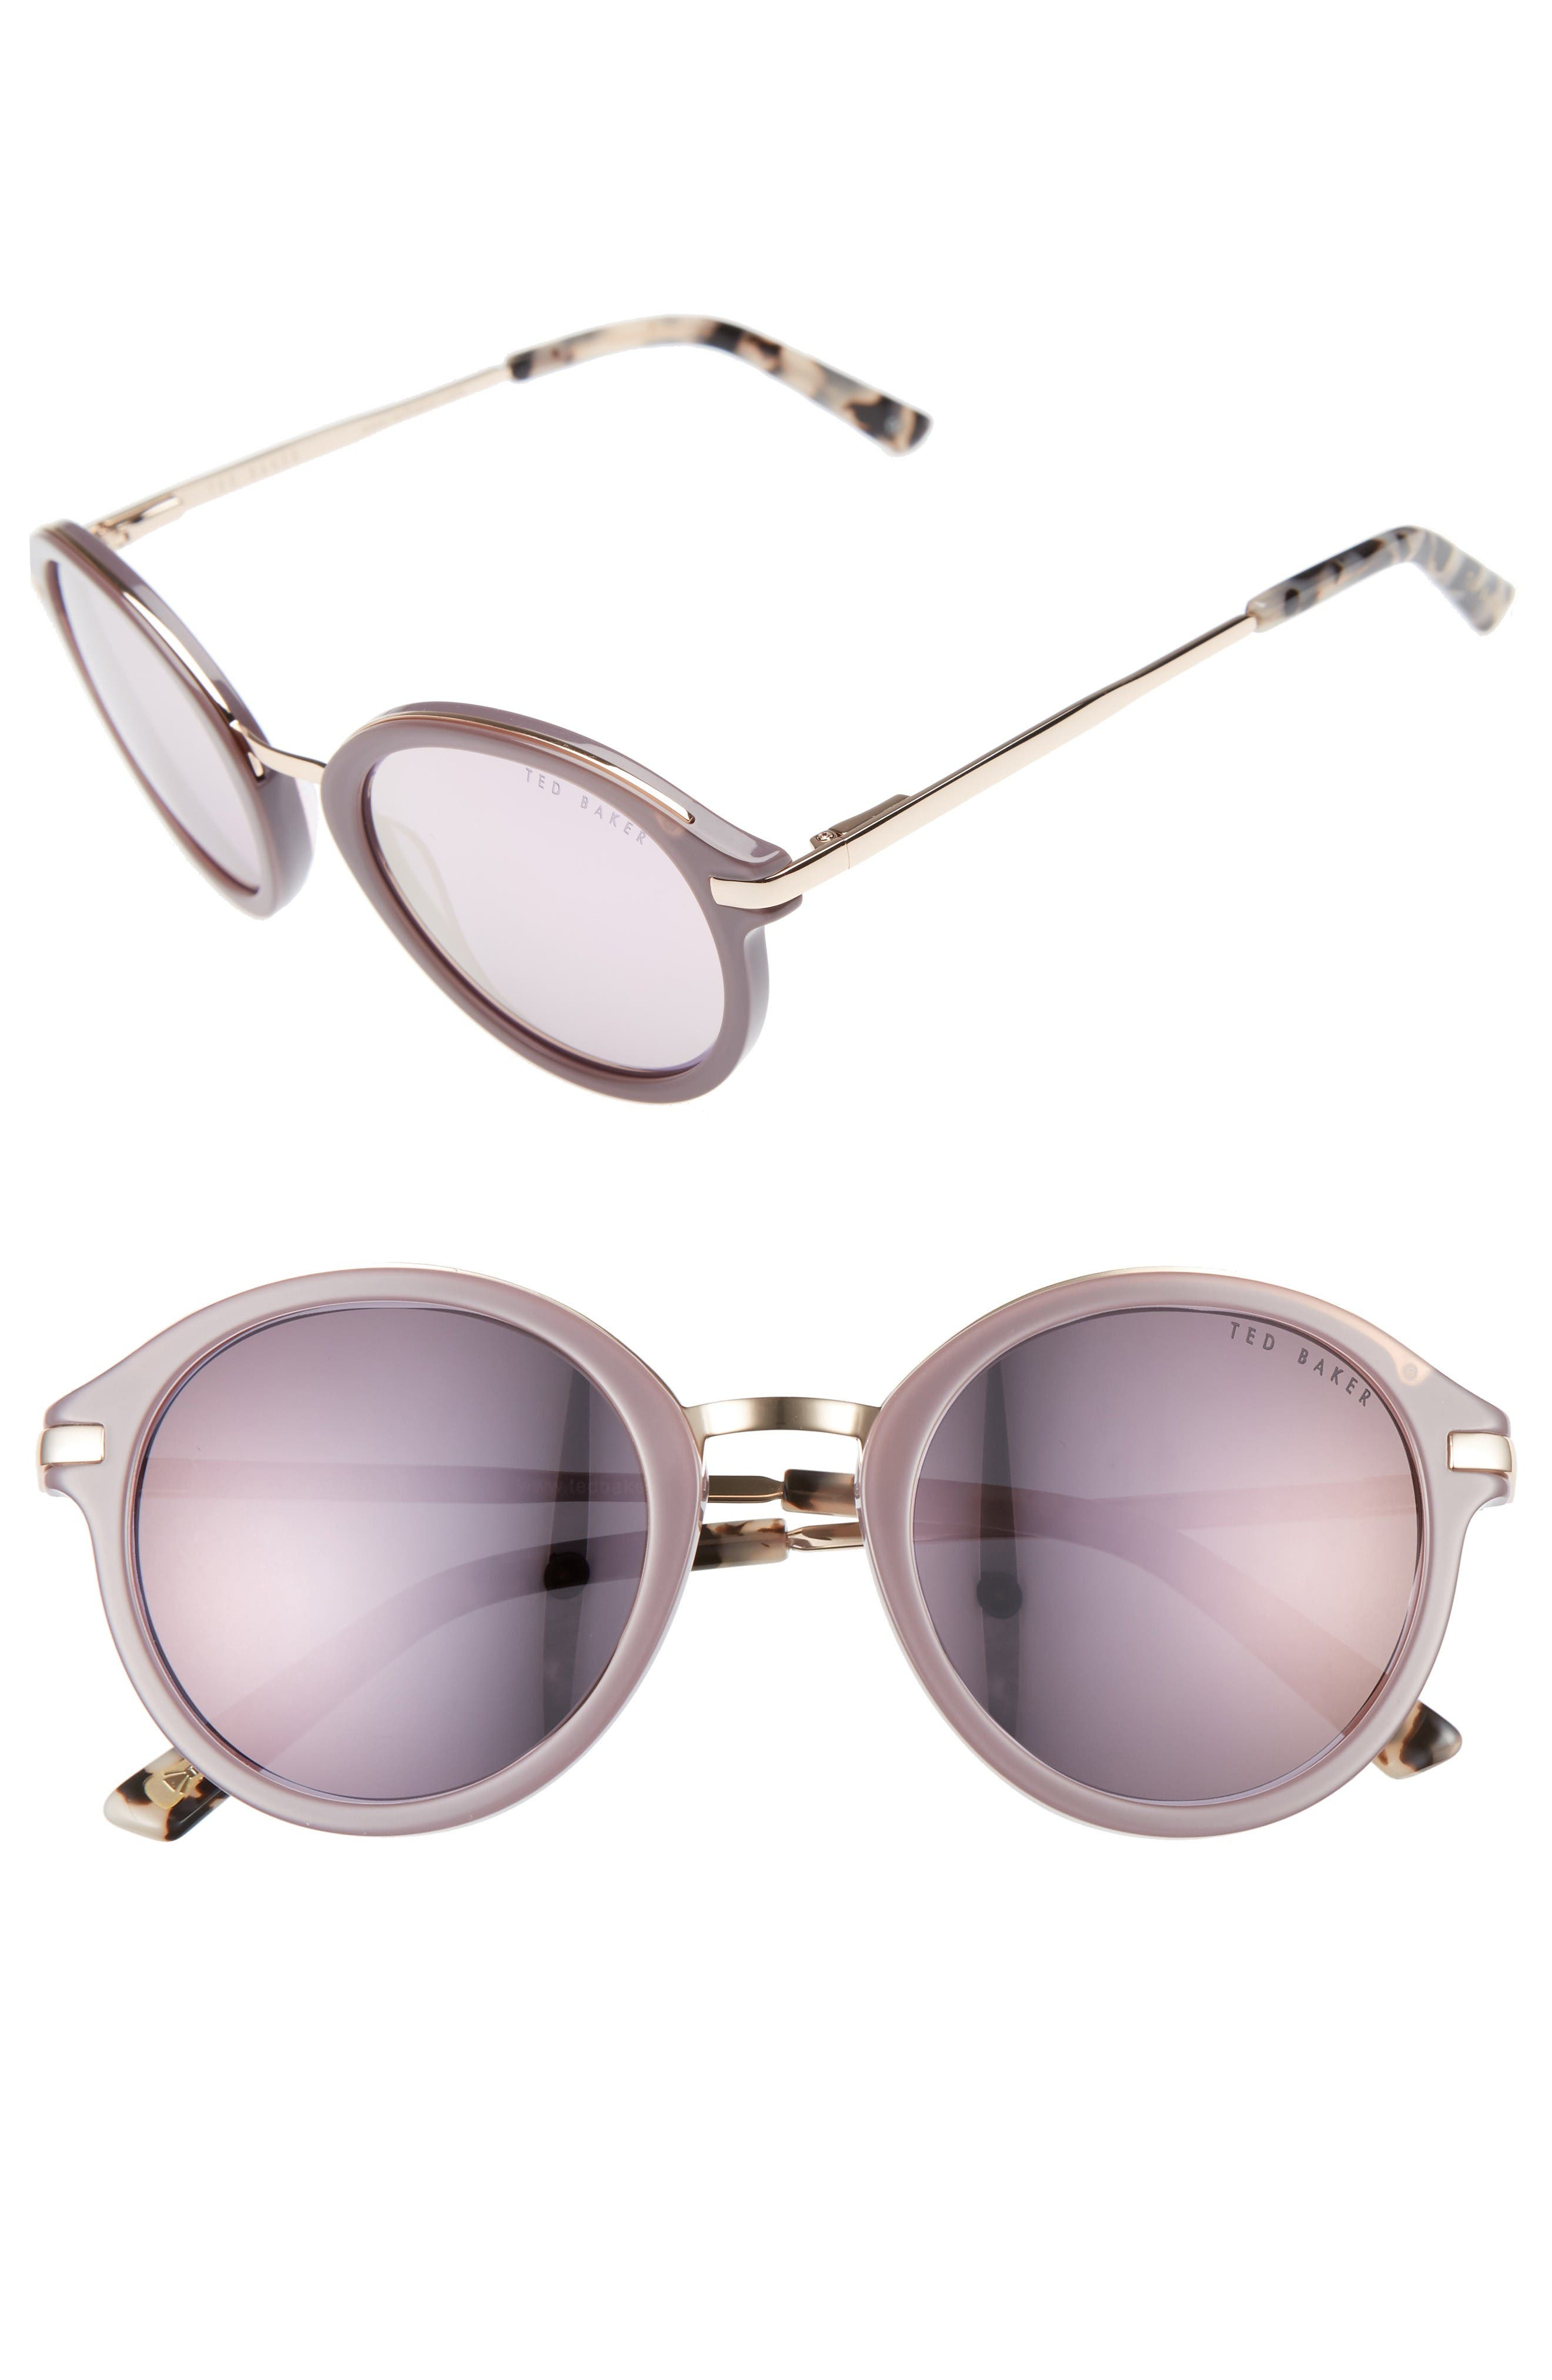 49mm Round Sunglasses,                         Main,                         color, Grey